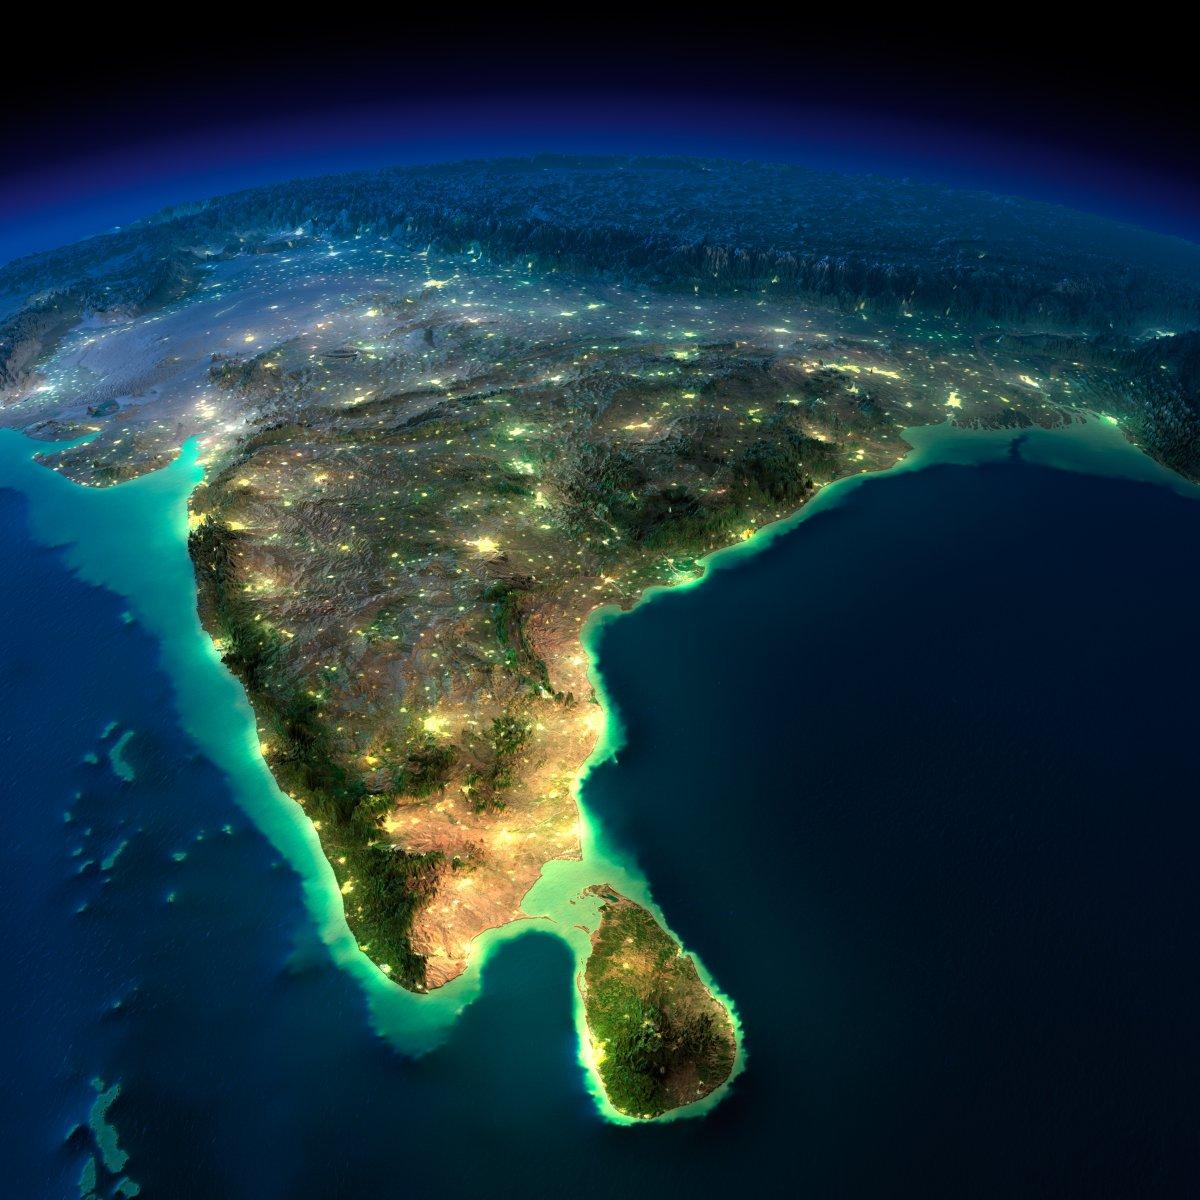 earth night photos india by anton balazh